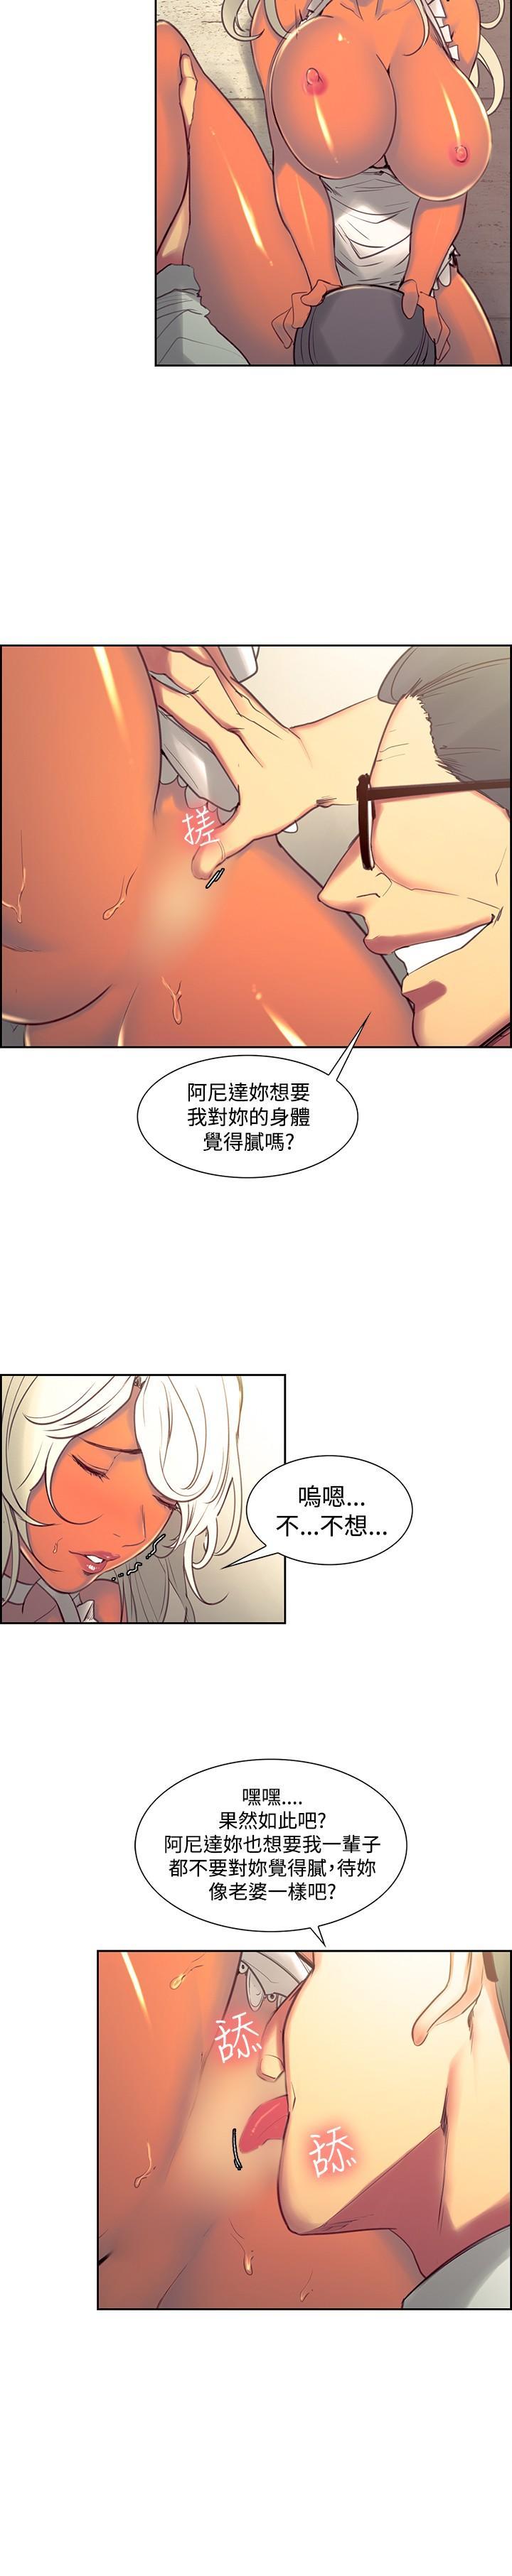 Domesticate the Housekeeper 调教家政妇 ch.29-32 41